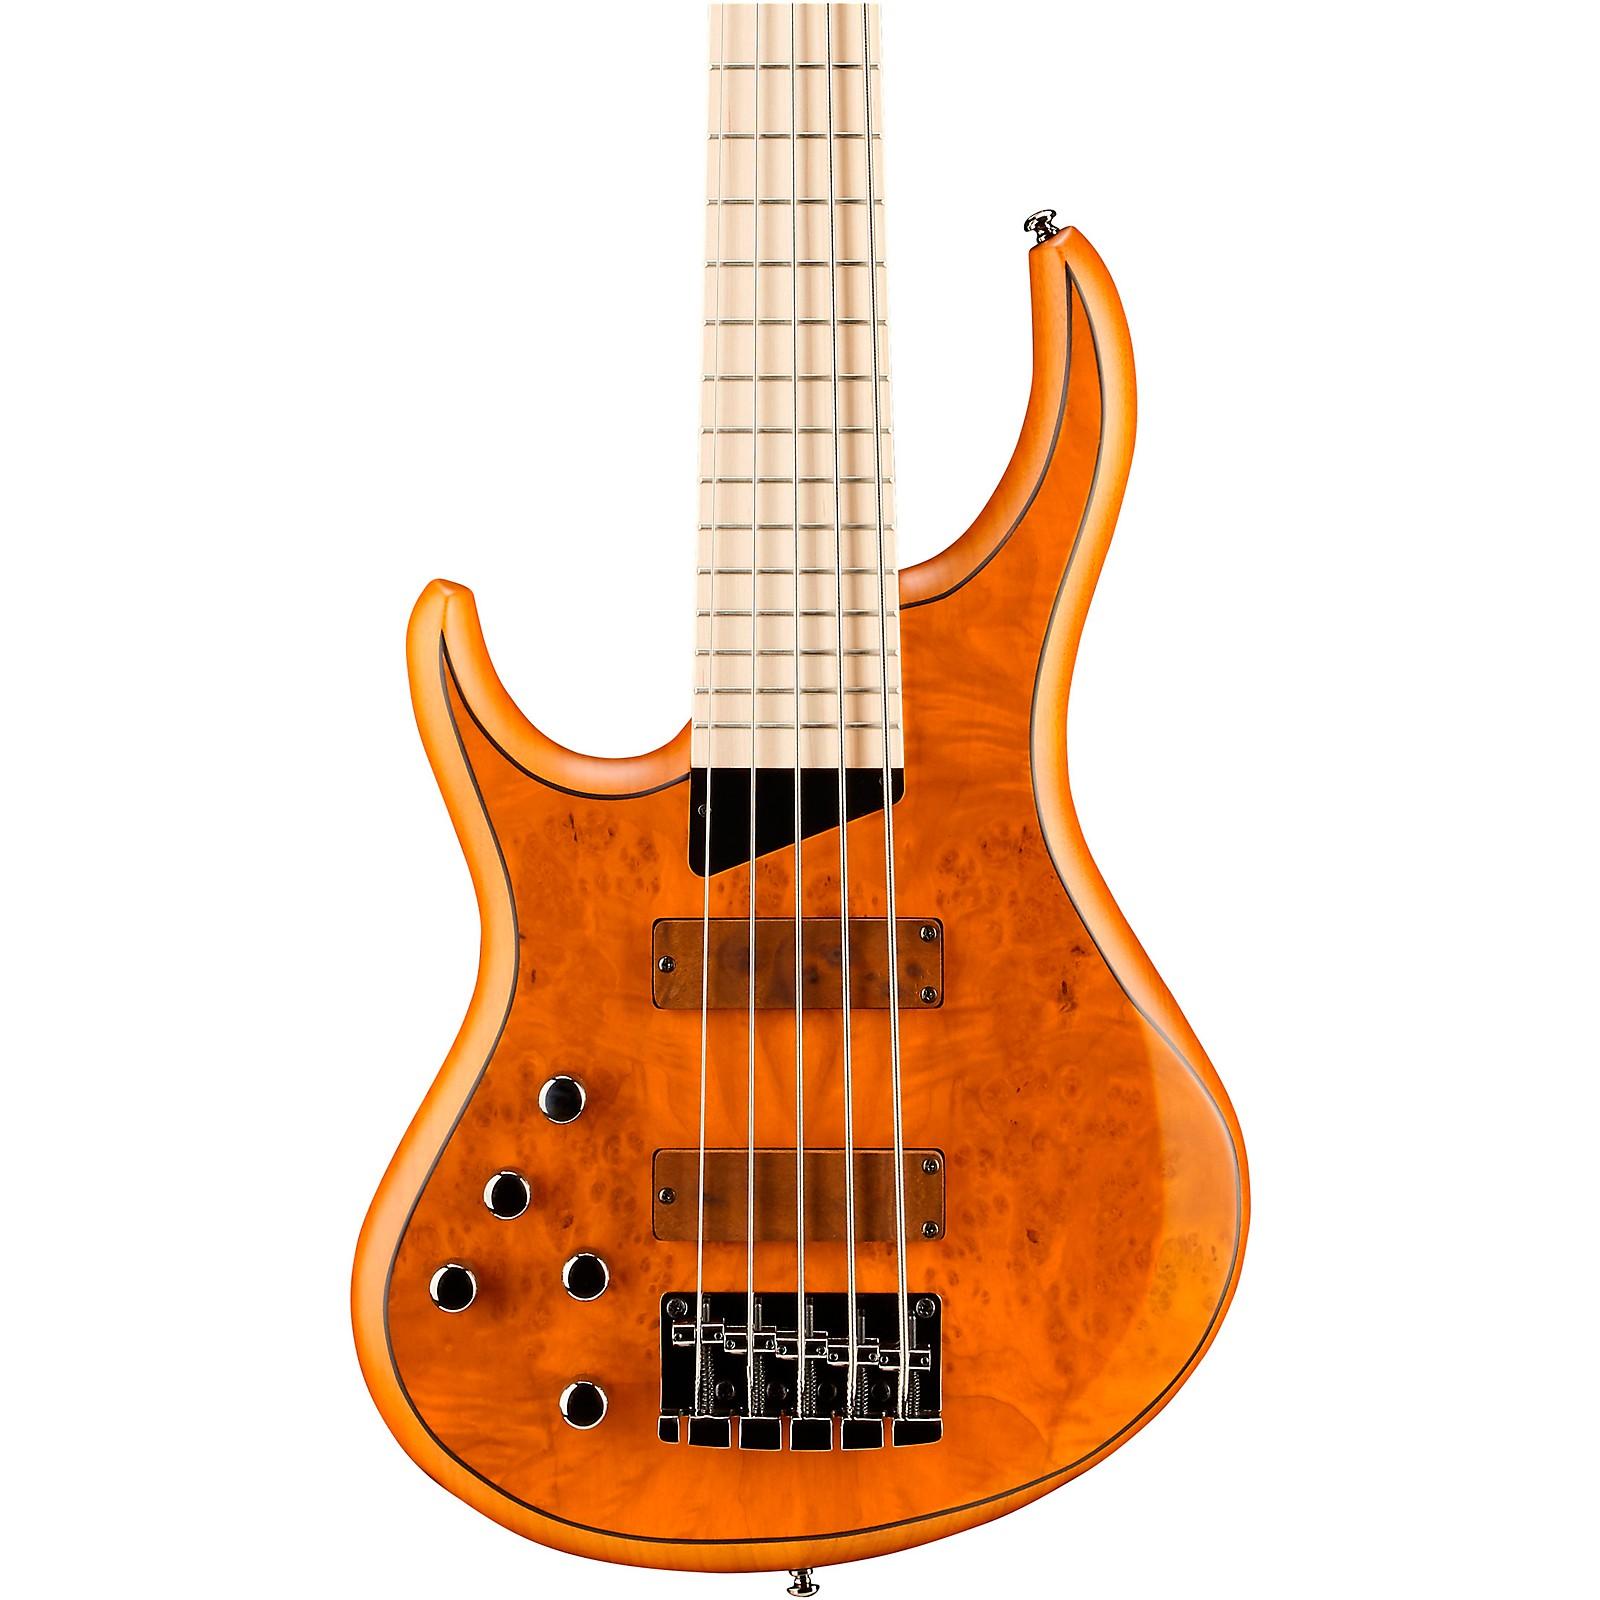 MTD Kingston KZ 5-String Left-Handed Electric Bass